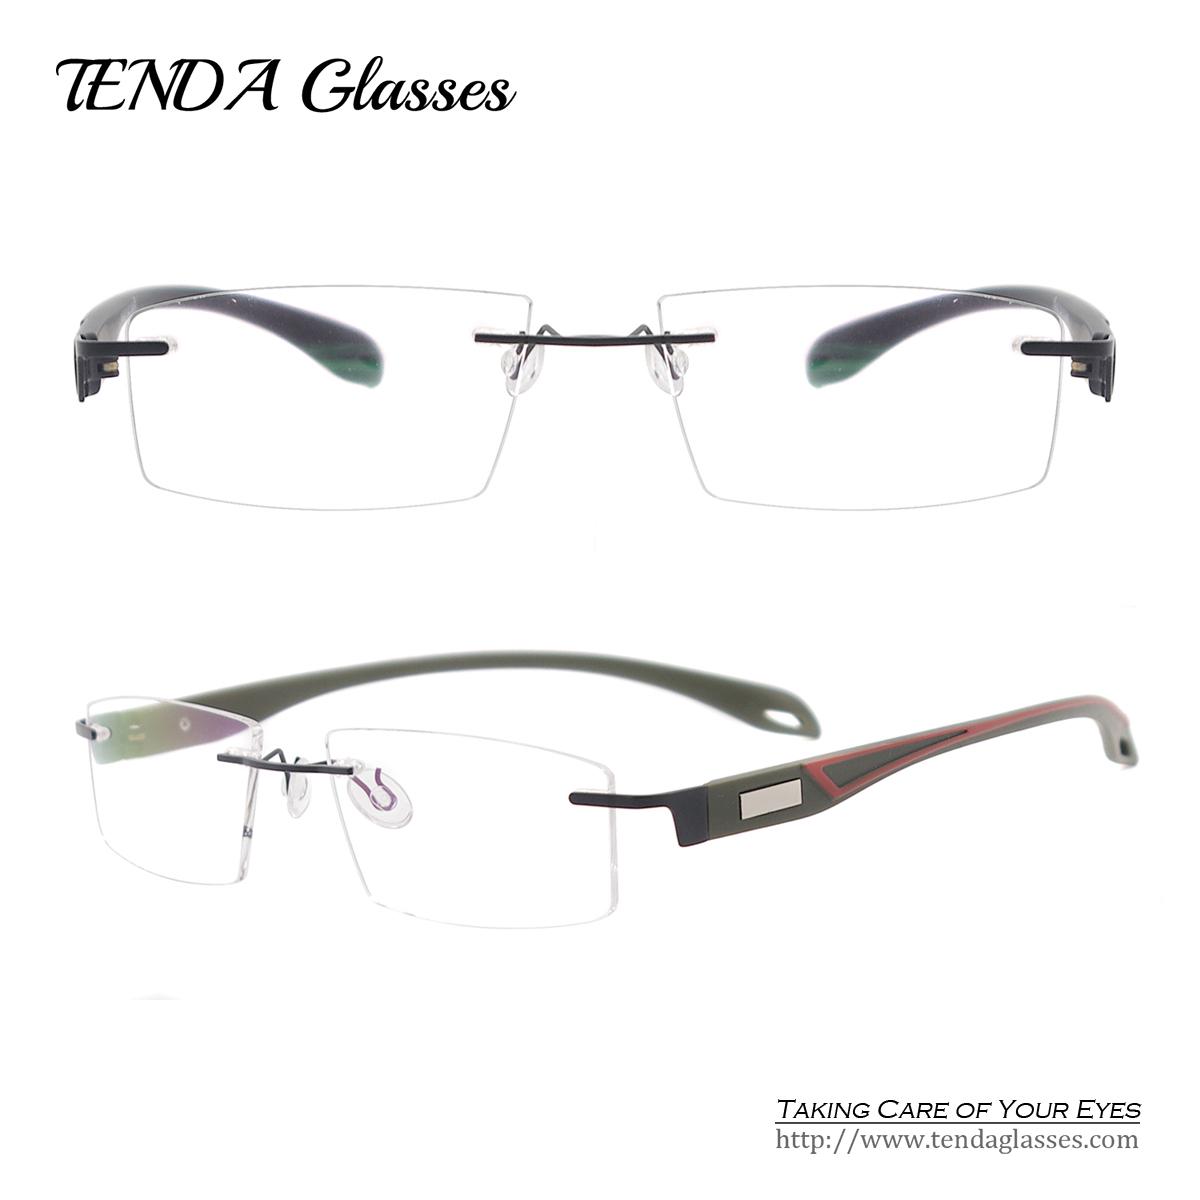 Men Fashion Colorful Lightweight Spectacles TR90 Rimless Eyeglass Frames Prescription Square Glasses For Optical Lenses(China (Mainland))